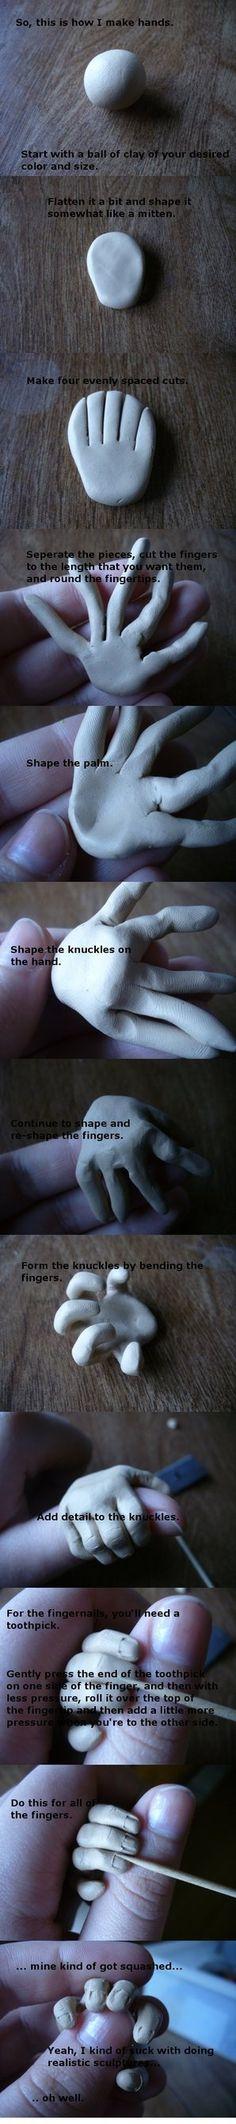 make hands